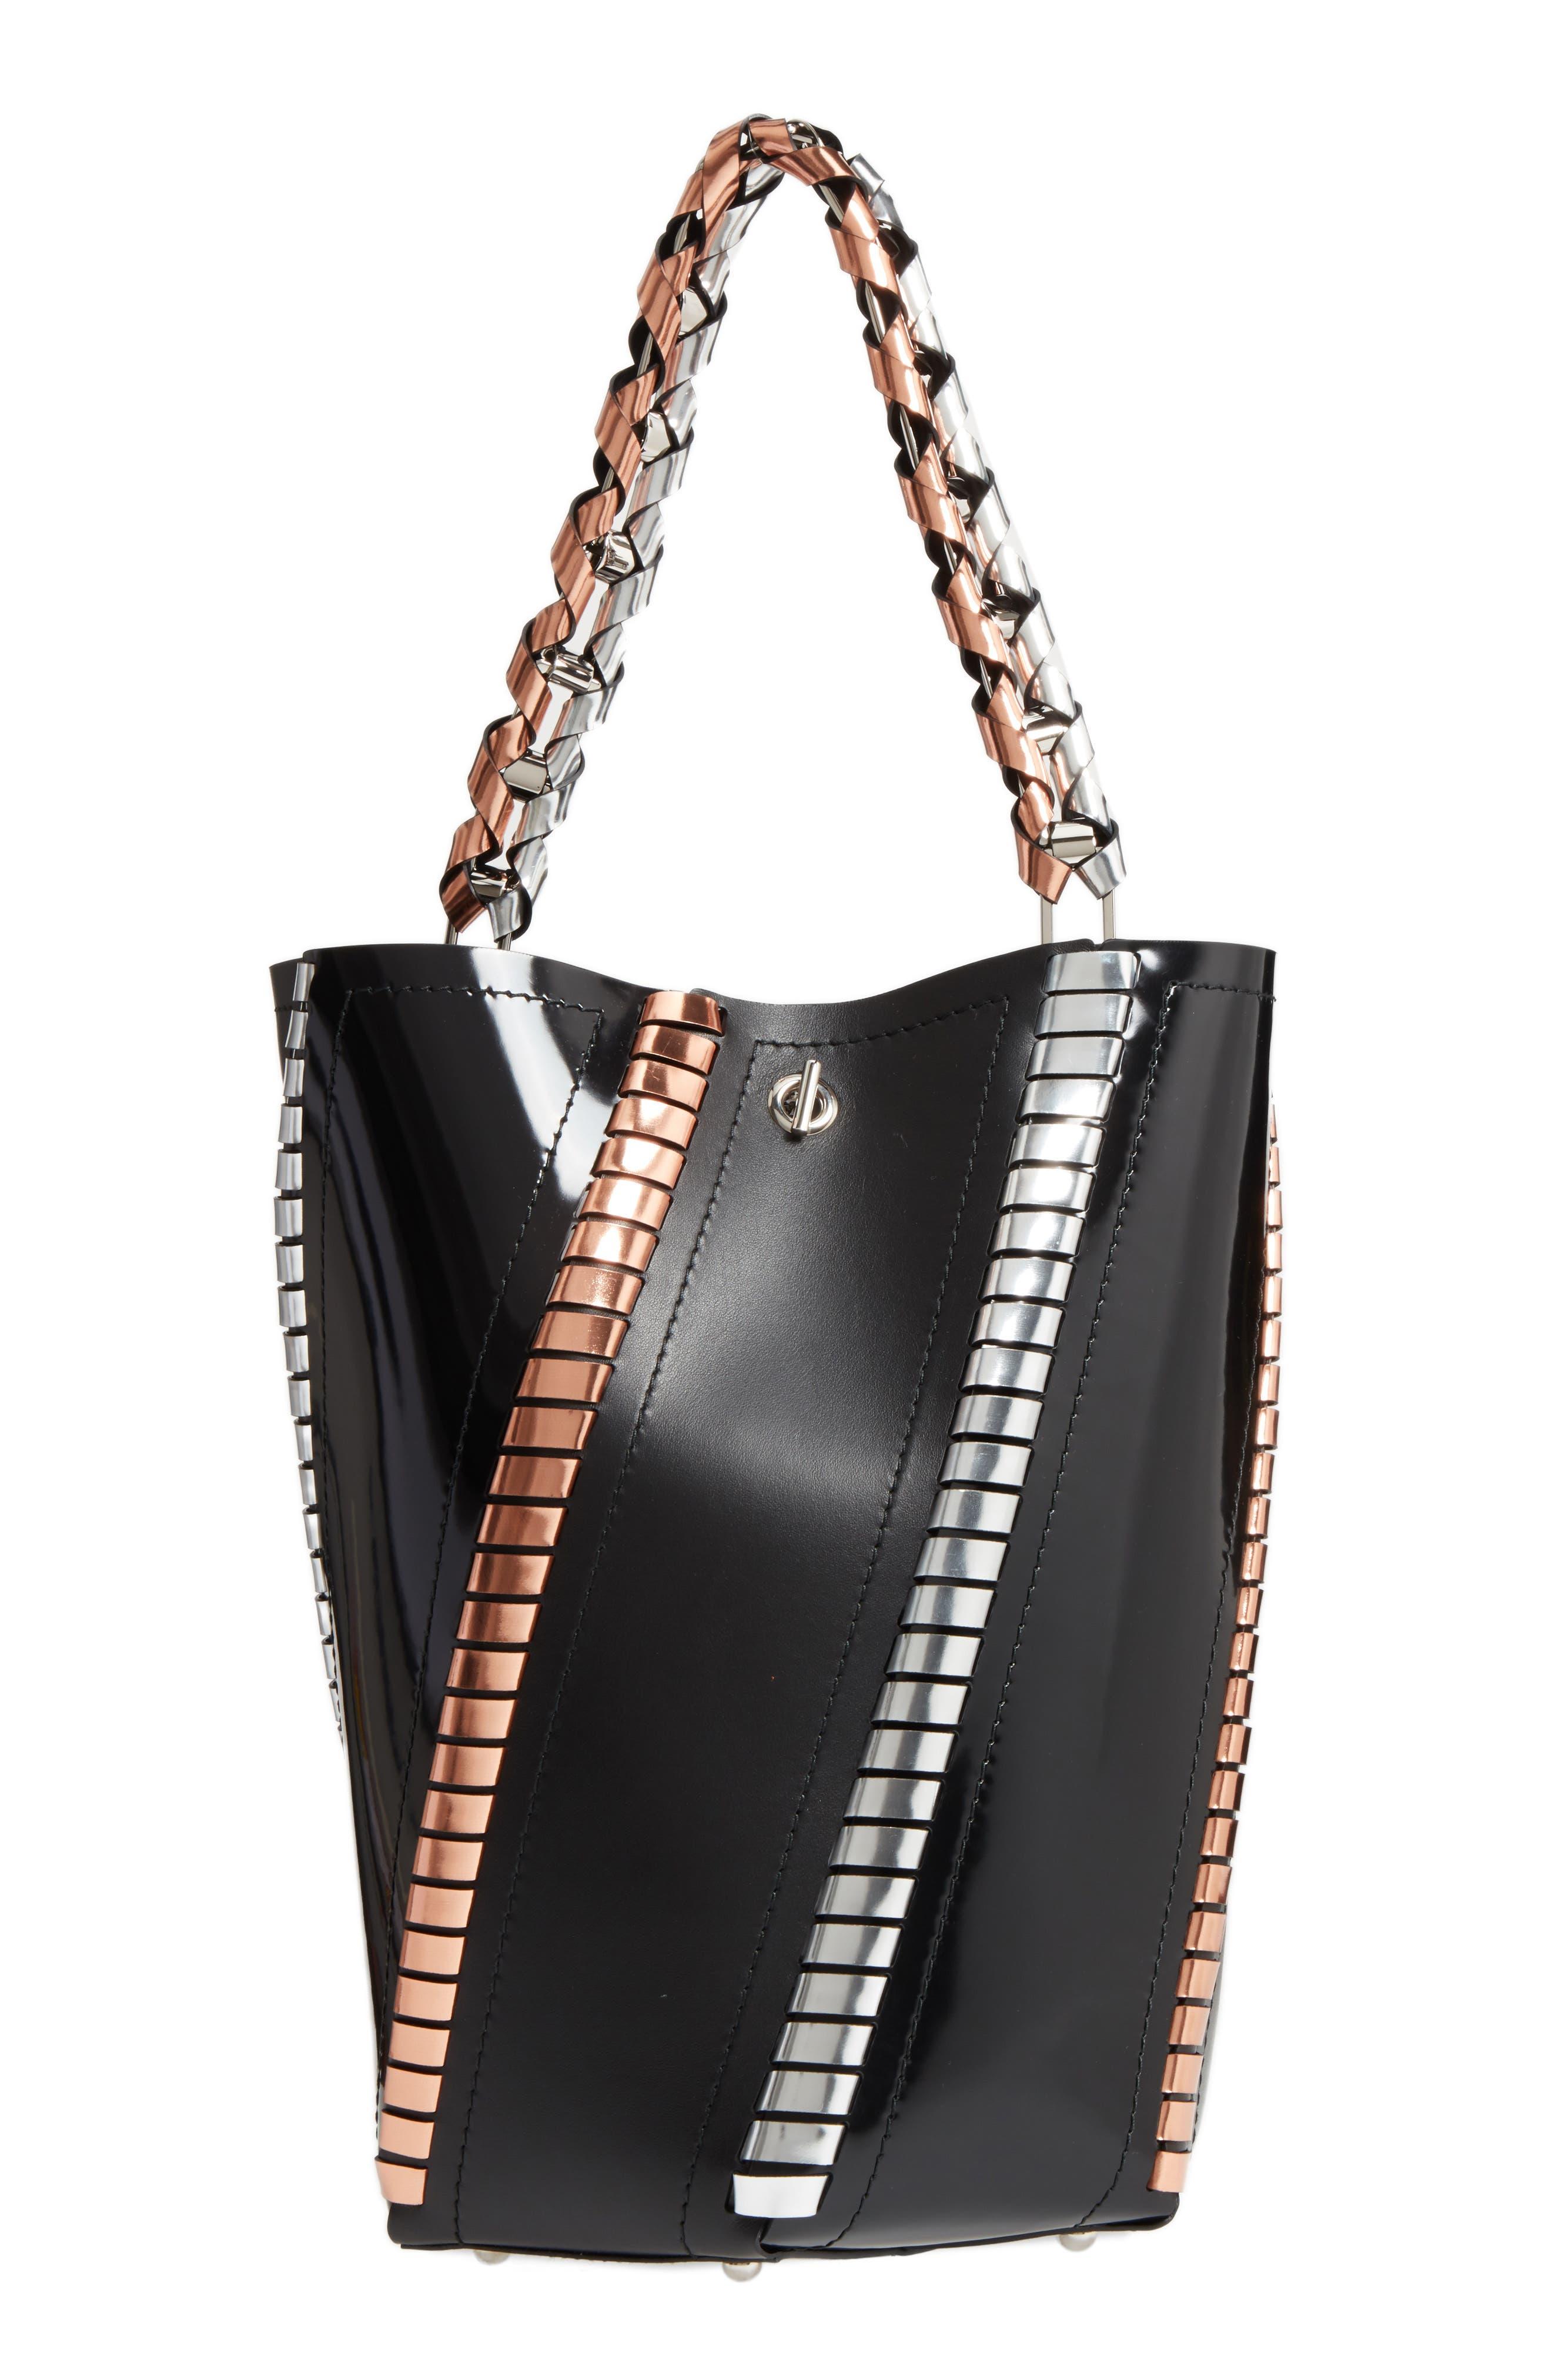 Medium Hex Metallic Whipstitch Leather Bucket Bag,                         Main,                         color, Black Mix